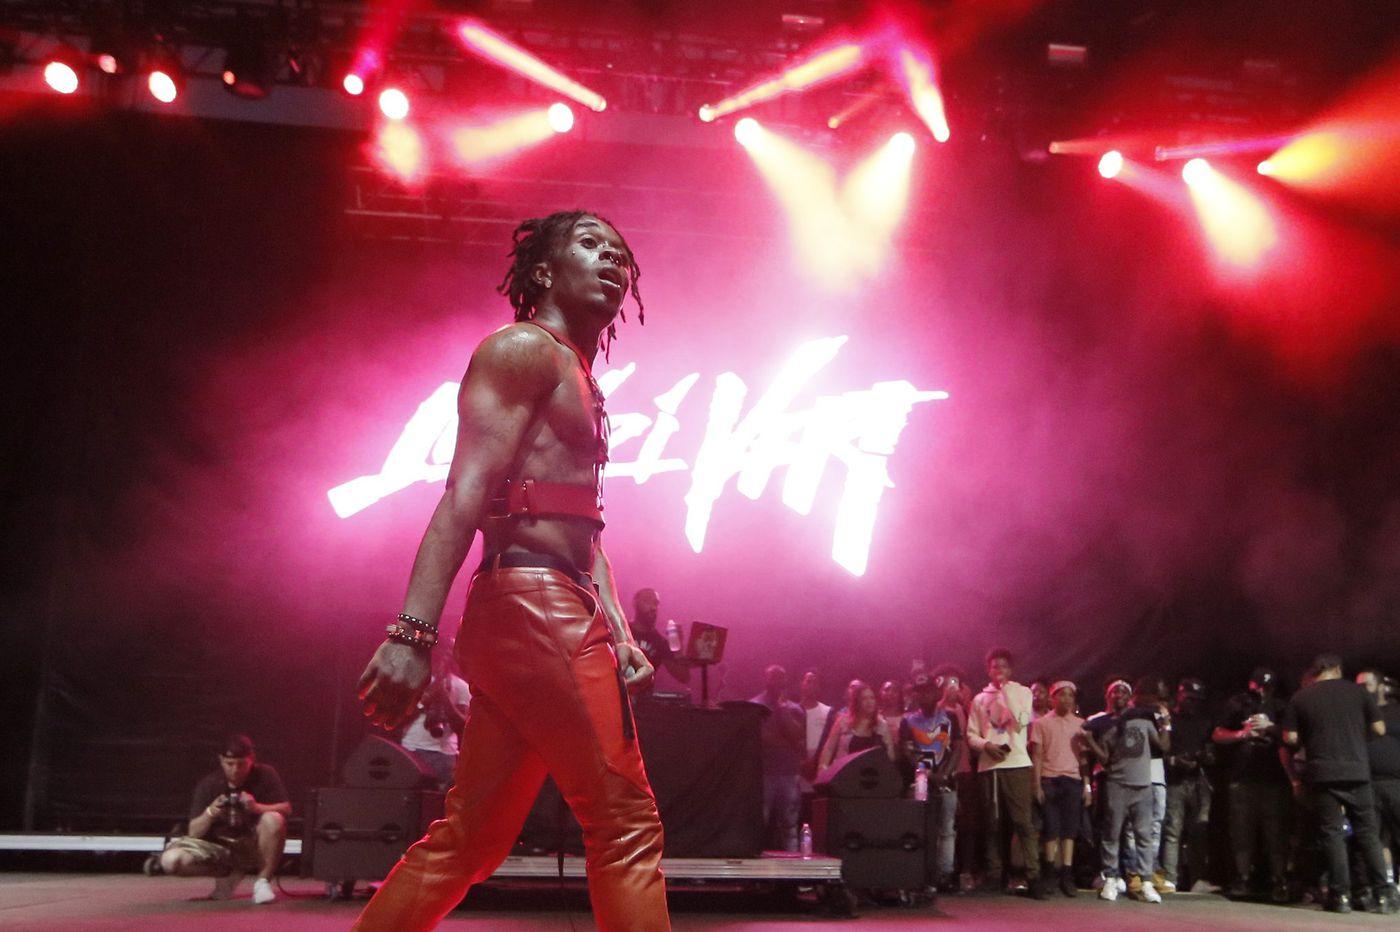 Meek Mill, Lil Uzi Vert to headline Power99 FM's 2018 'Powerhouse' concert